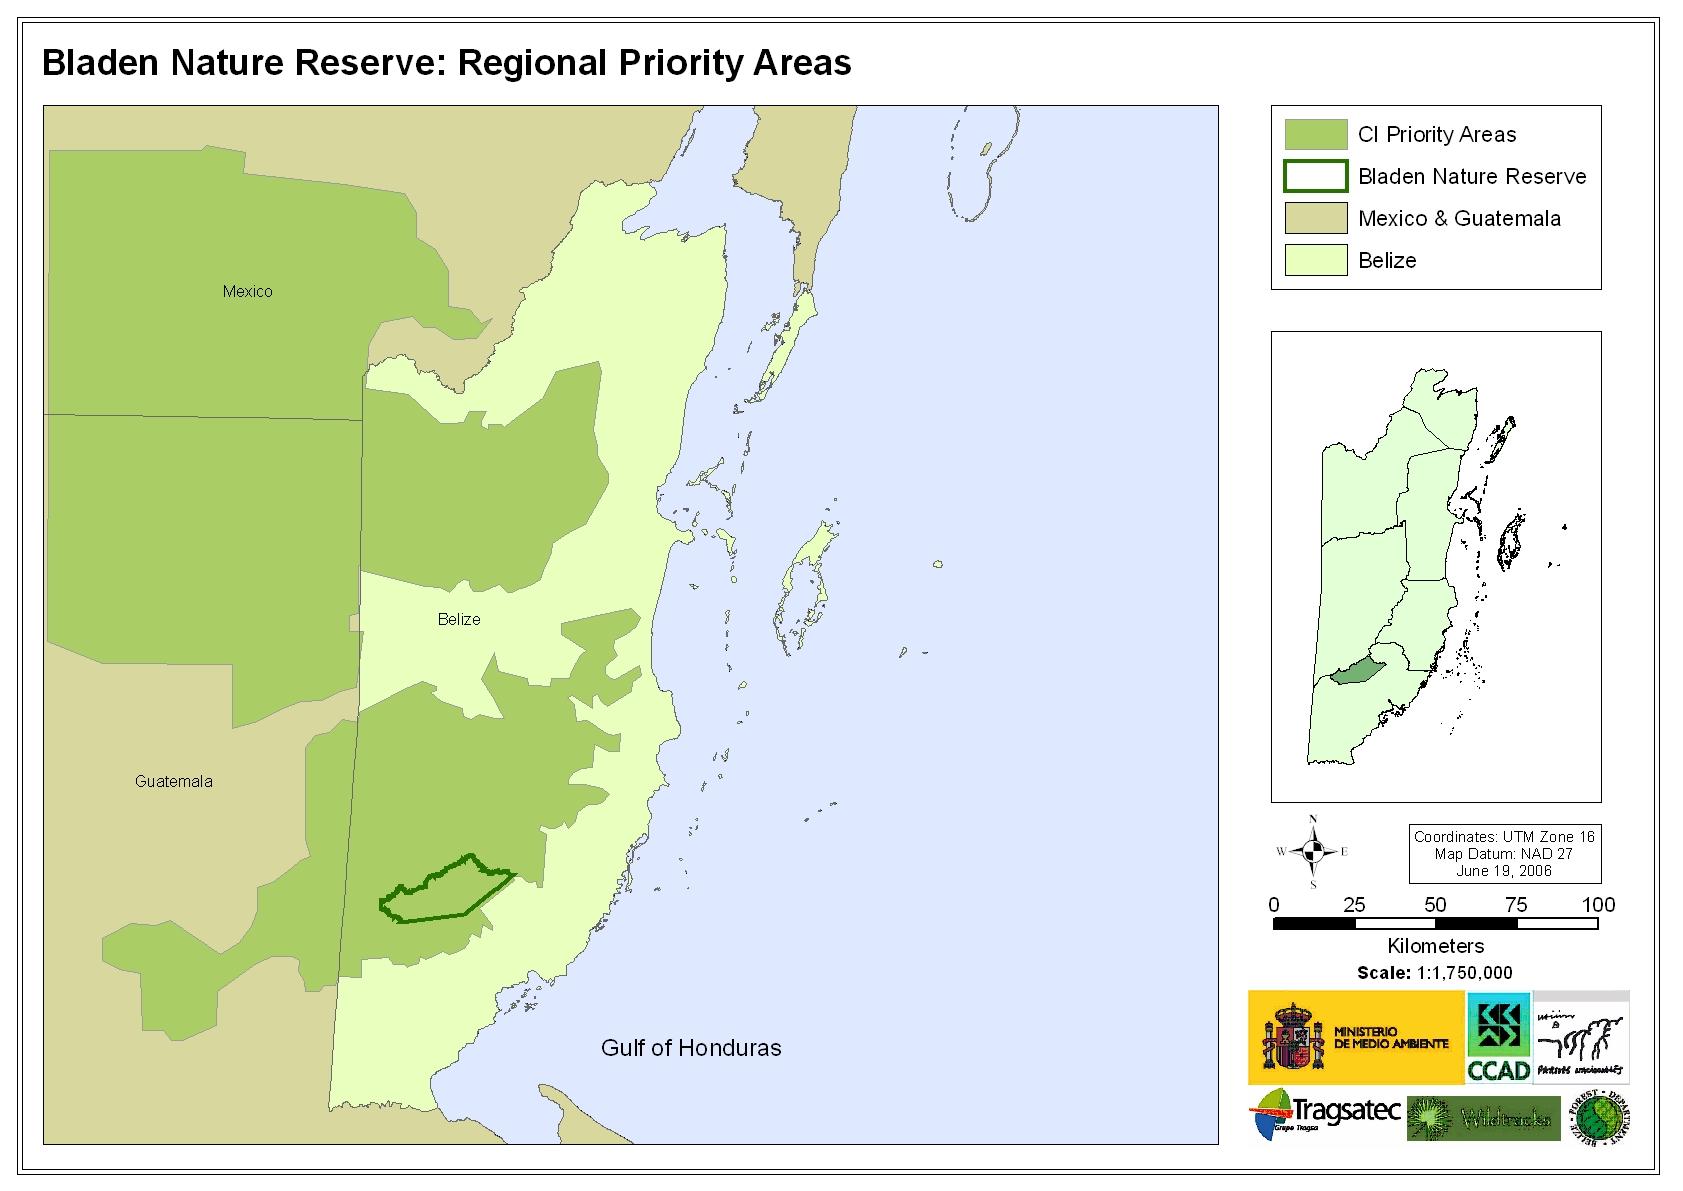 Bladen Nature Reserve: Regional Priority Areas